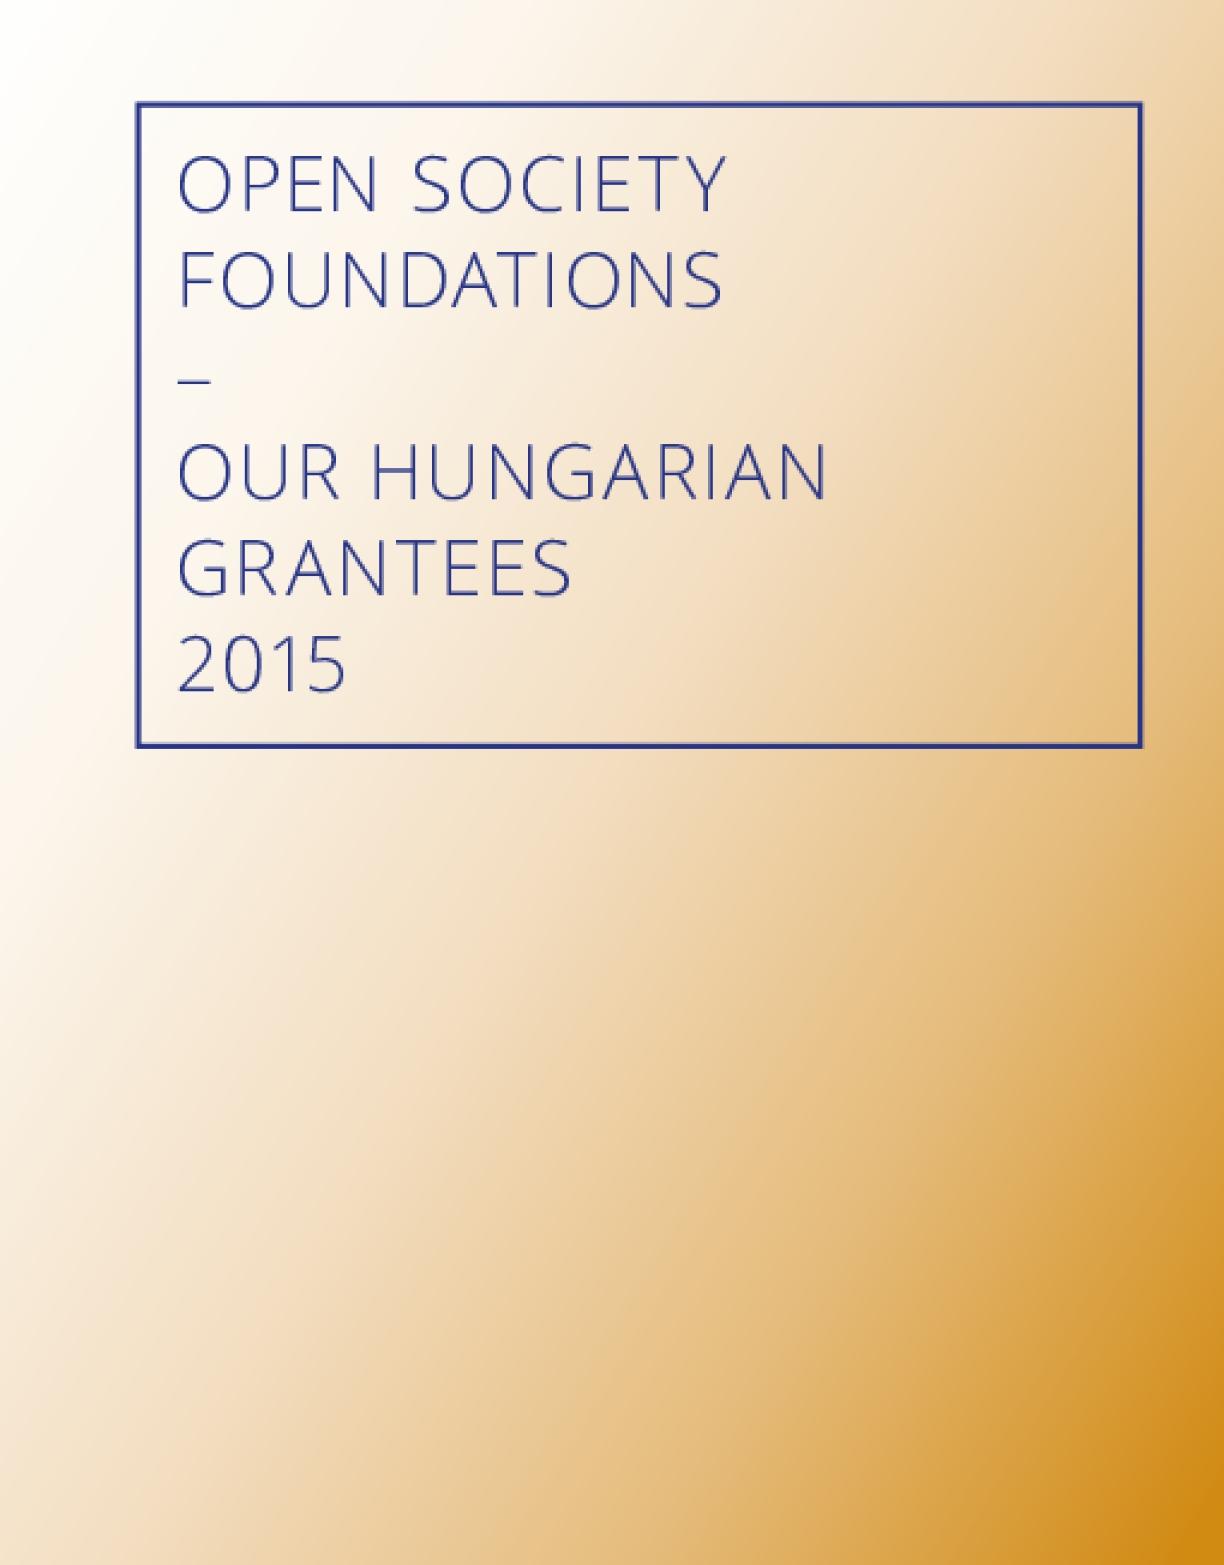 Open Society Hungarian Grantees 2015